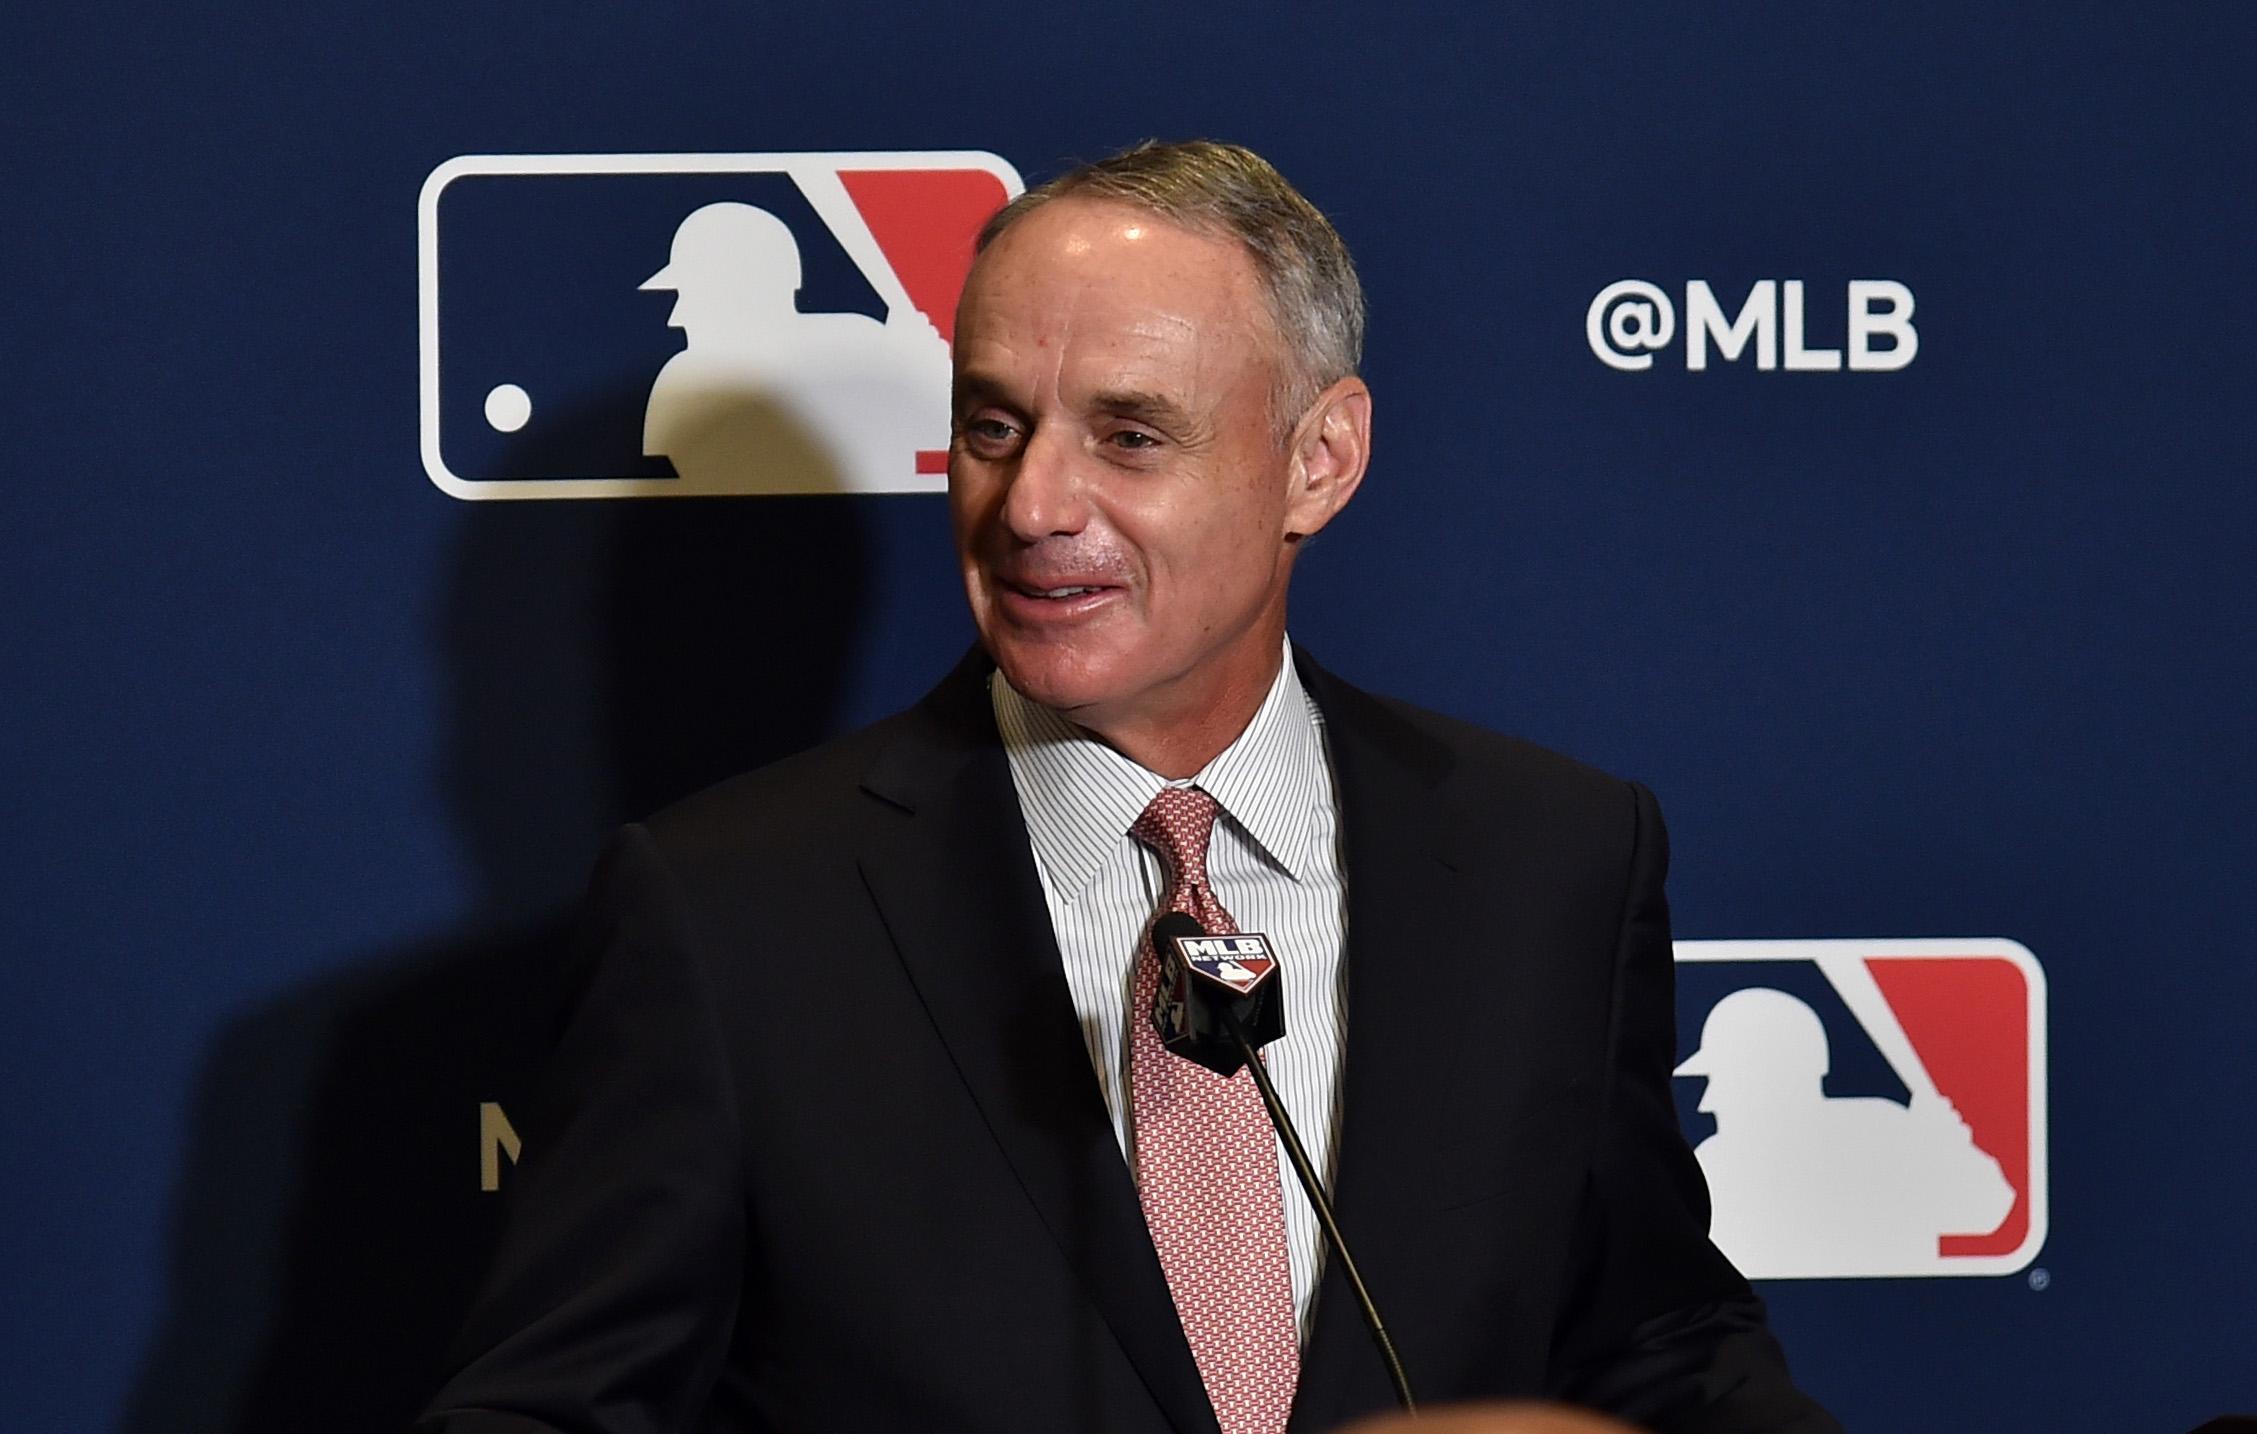 Carter Stewart to sign overseas, forgo 2019 MLB draft